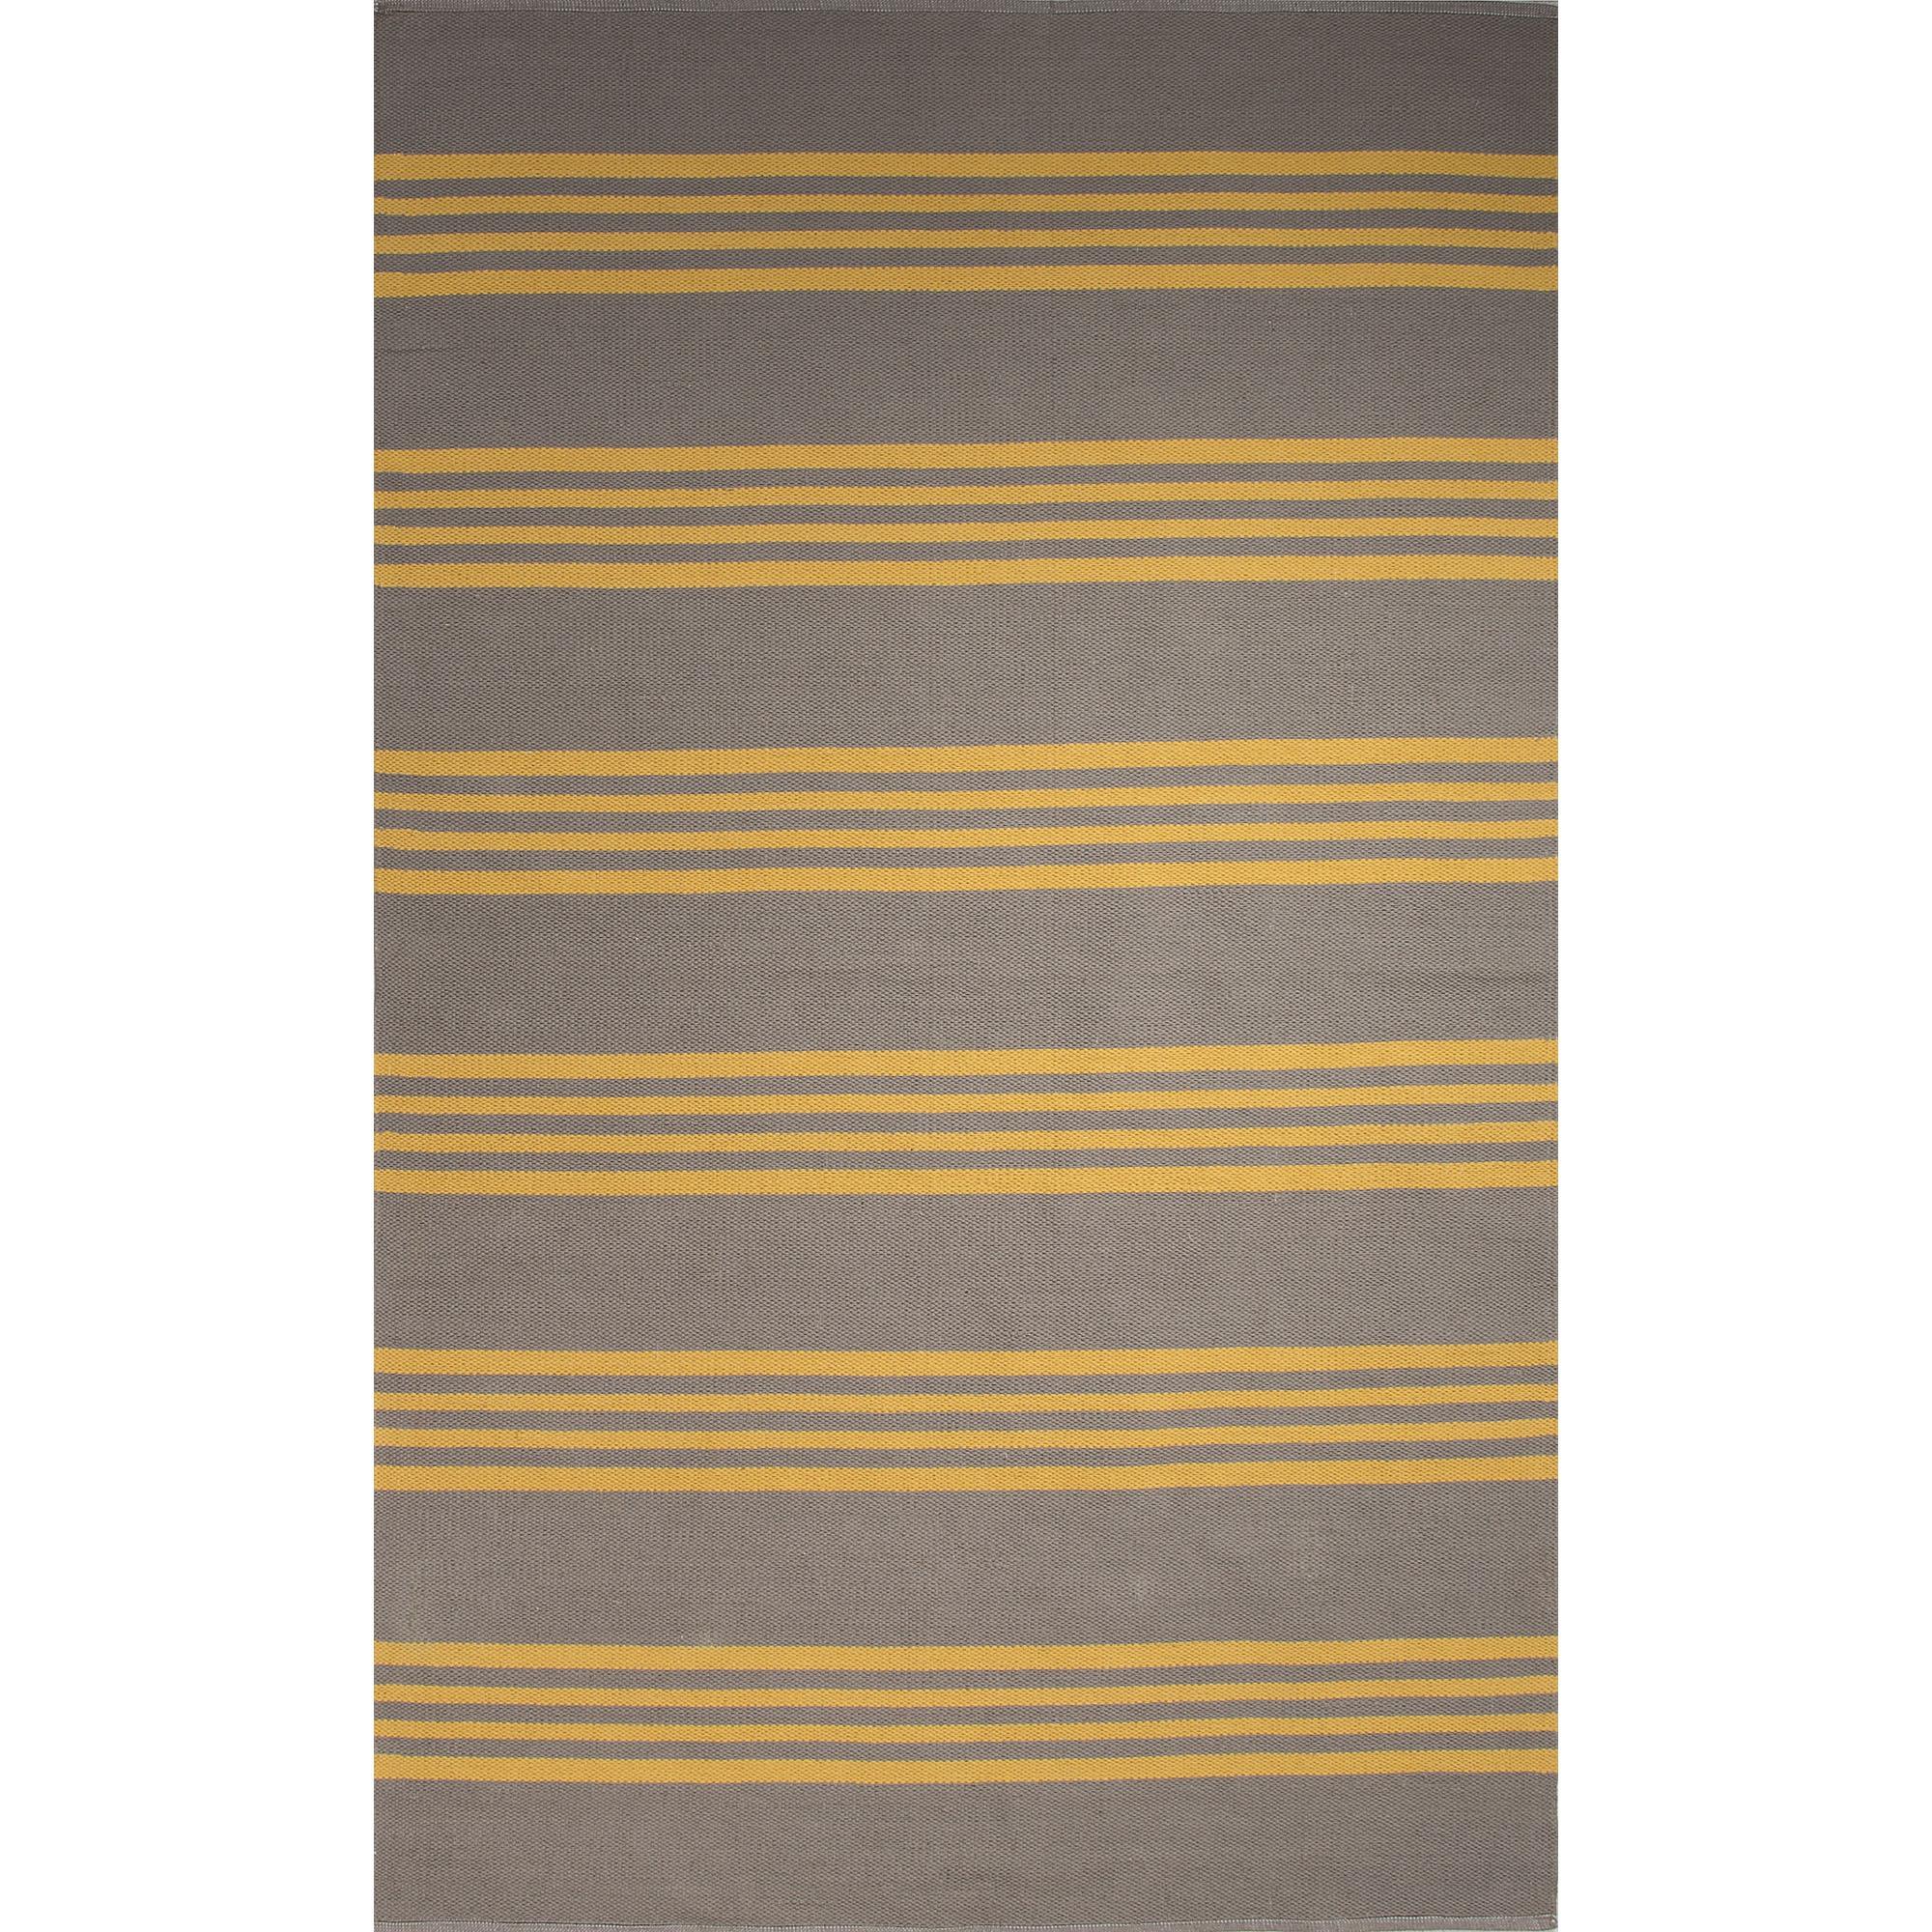 JAIPUR Rugs Sonoma 8 x 11 Rug - Item Number: RUG123854